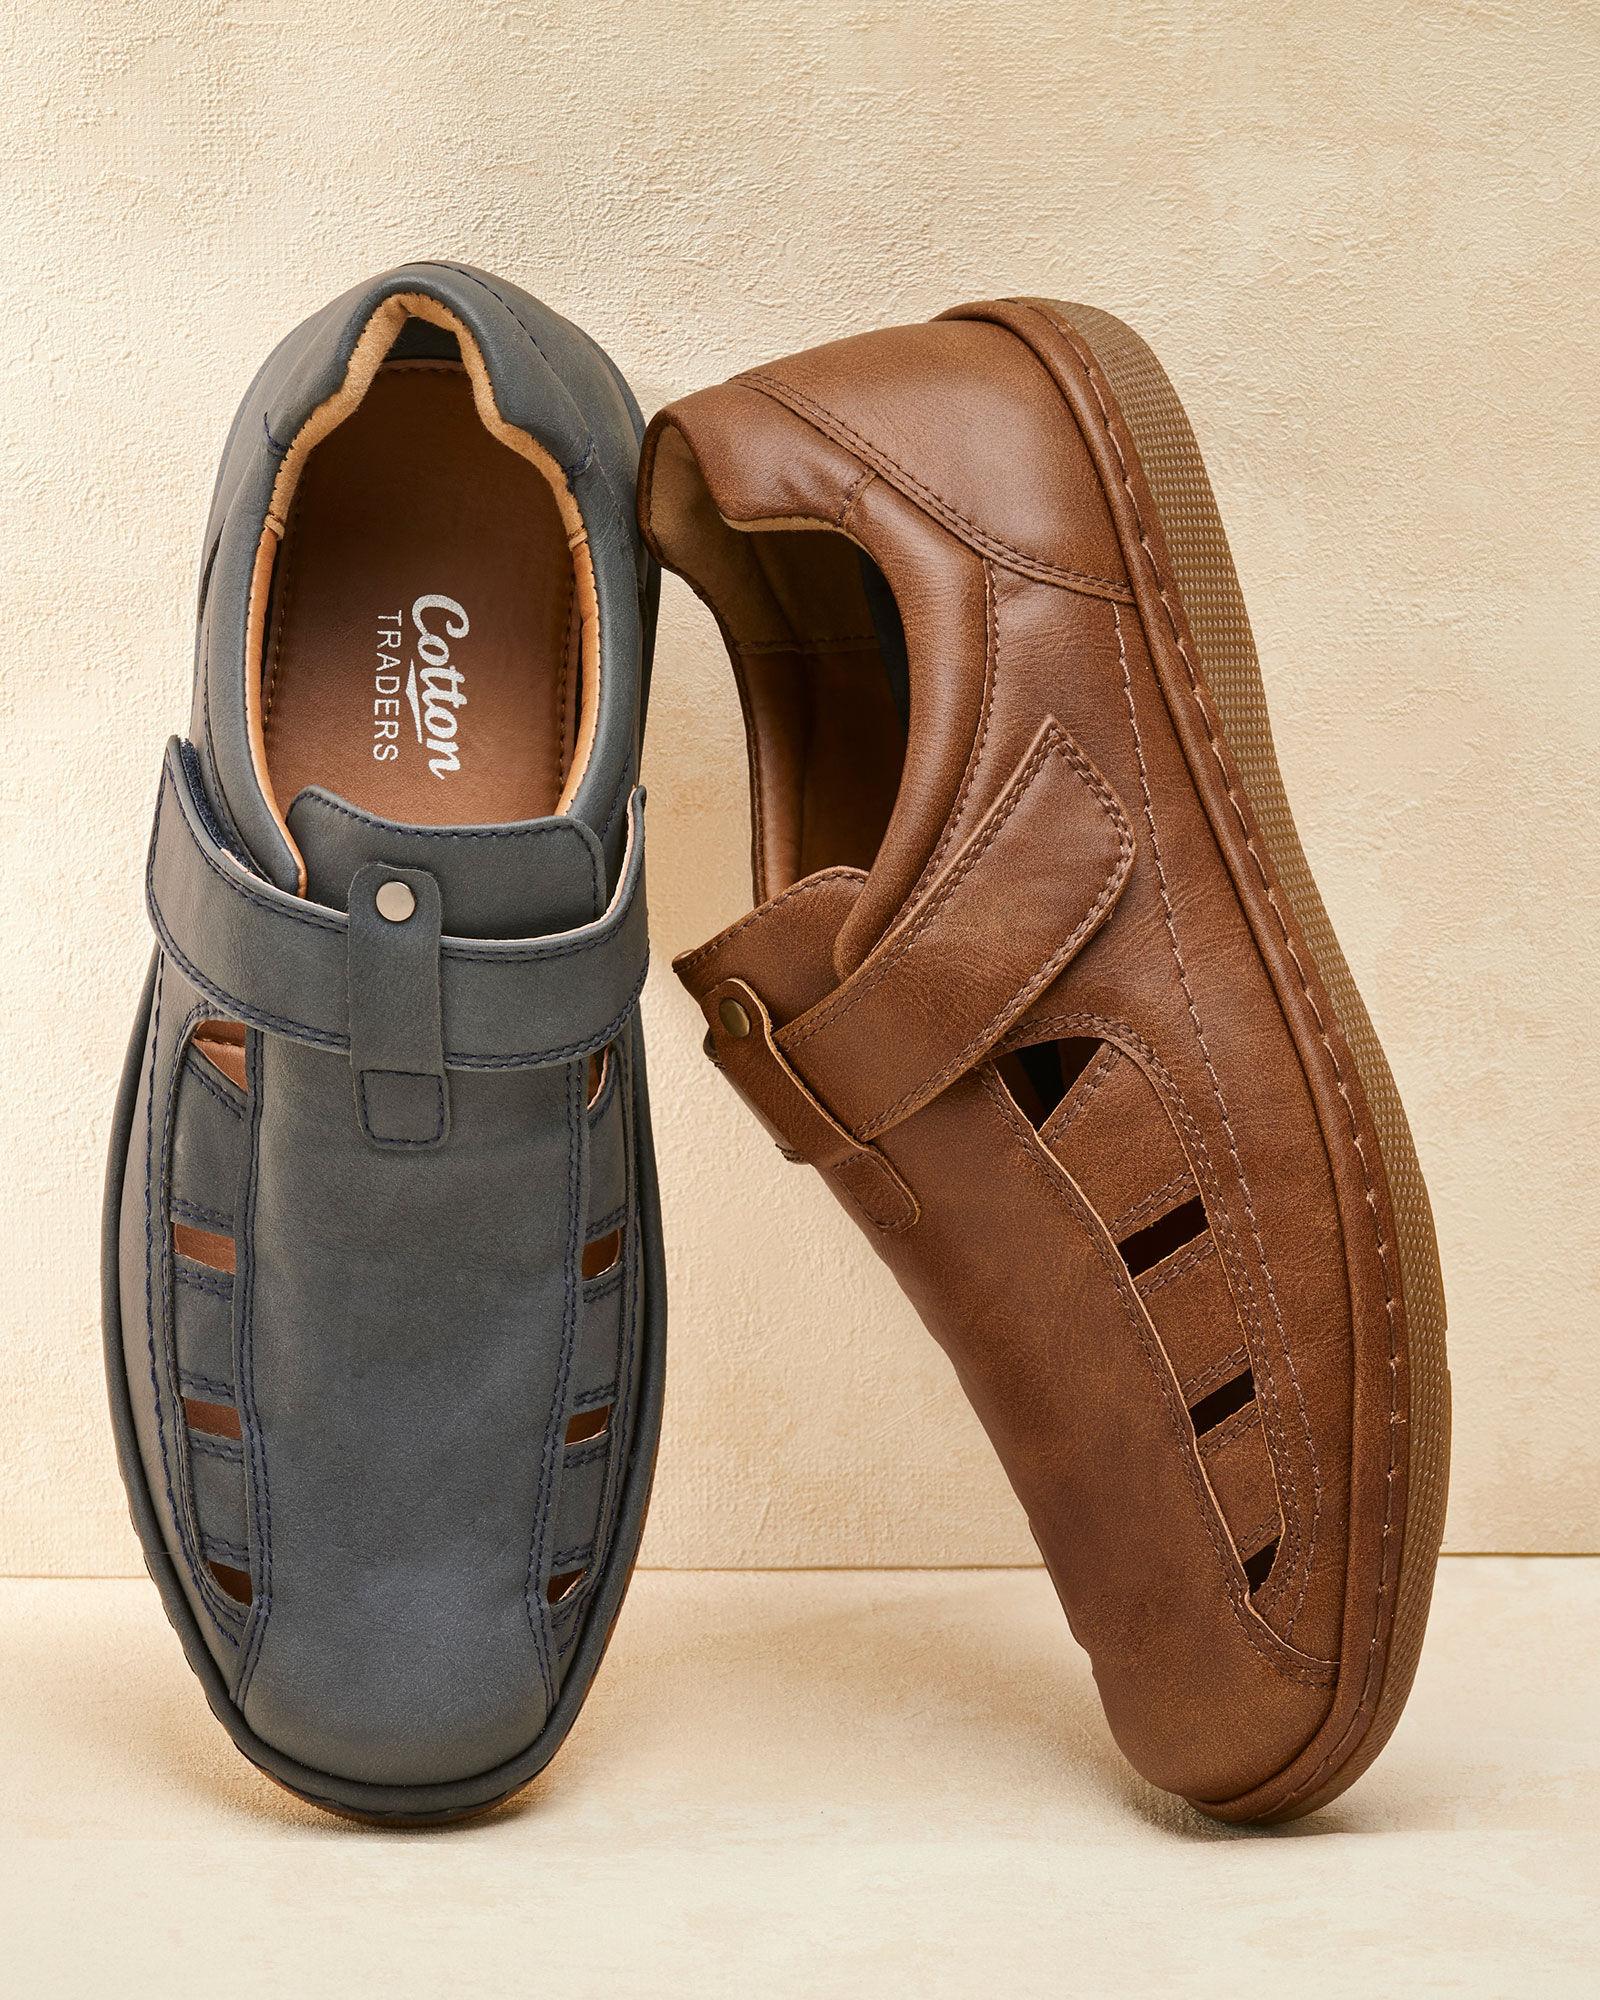 Men's Sandals   Cotton Traders